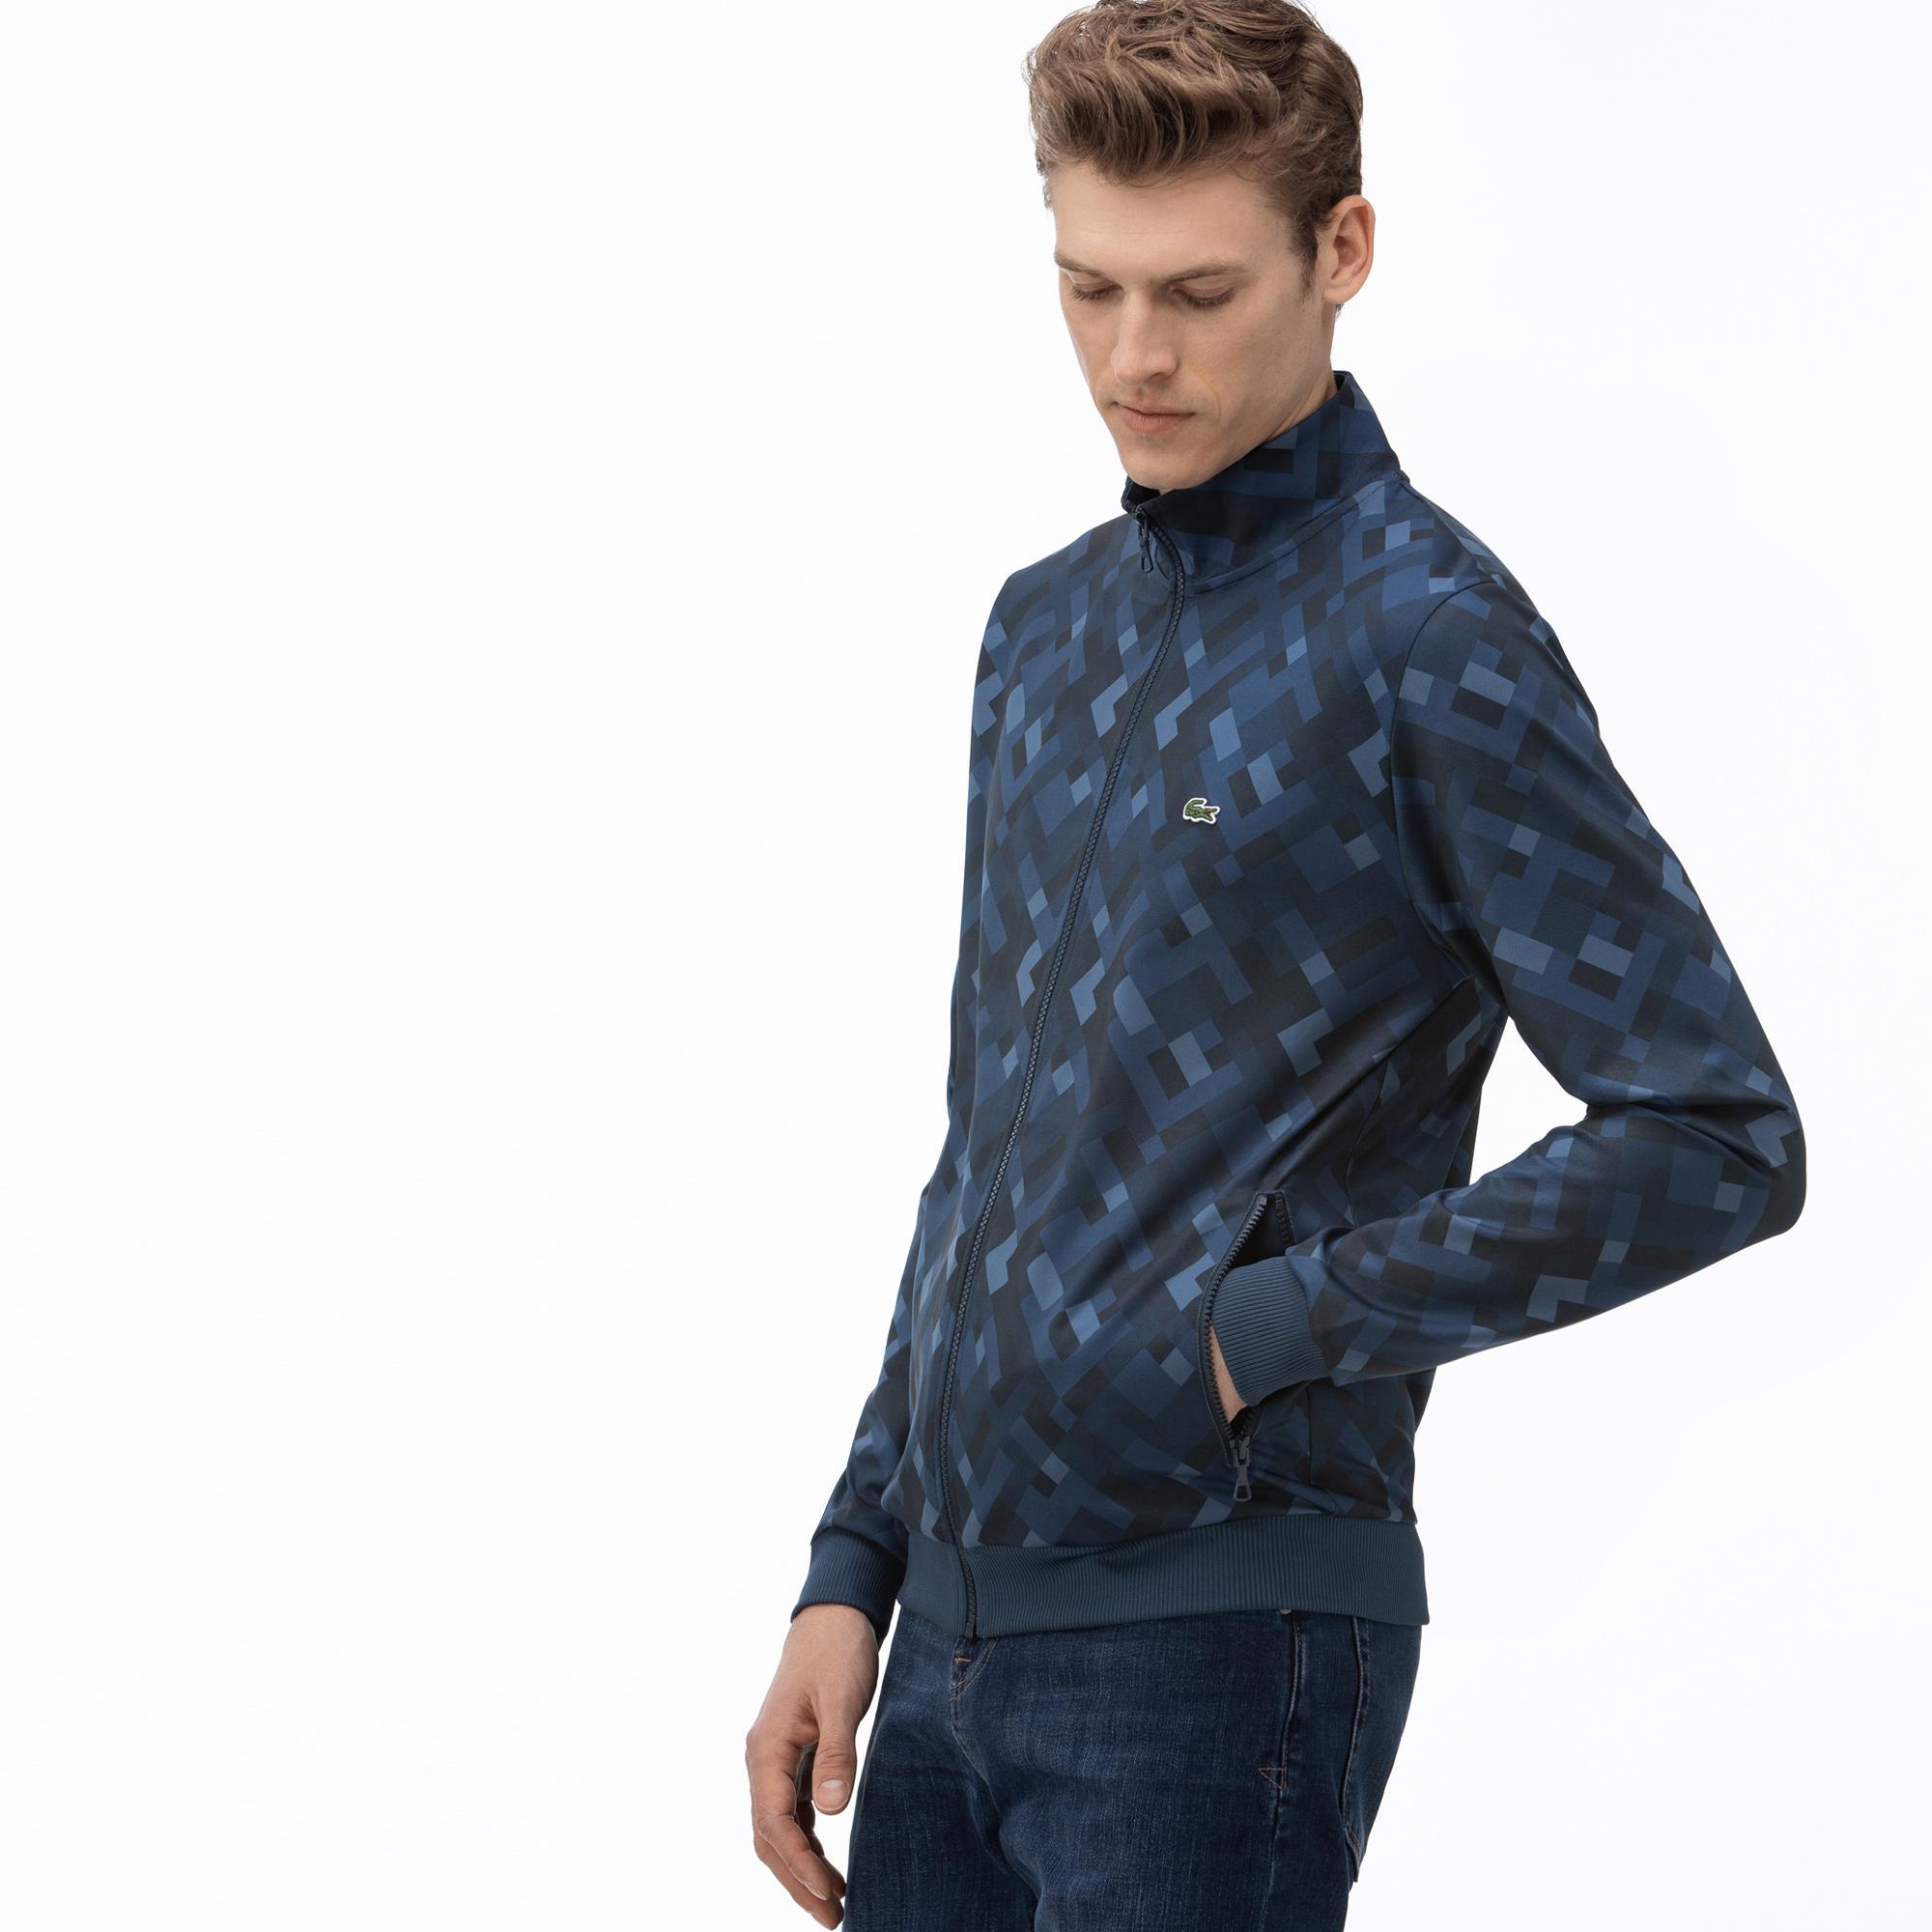 Lacoste Erkek Fermuarlı Desenli Lacivert Sweatshirt